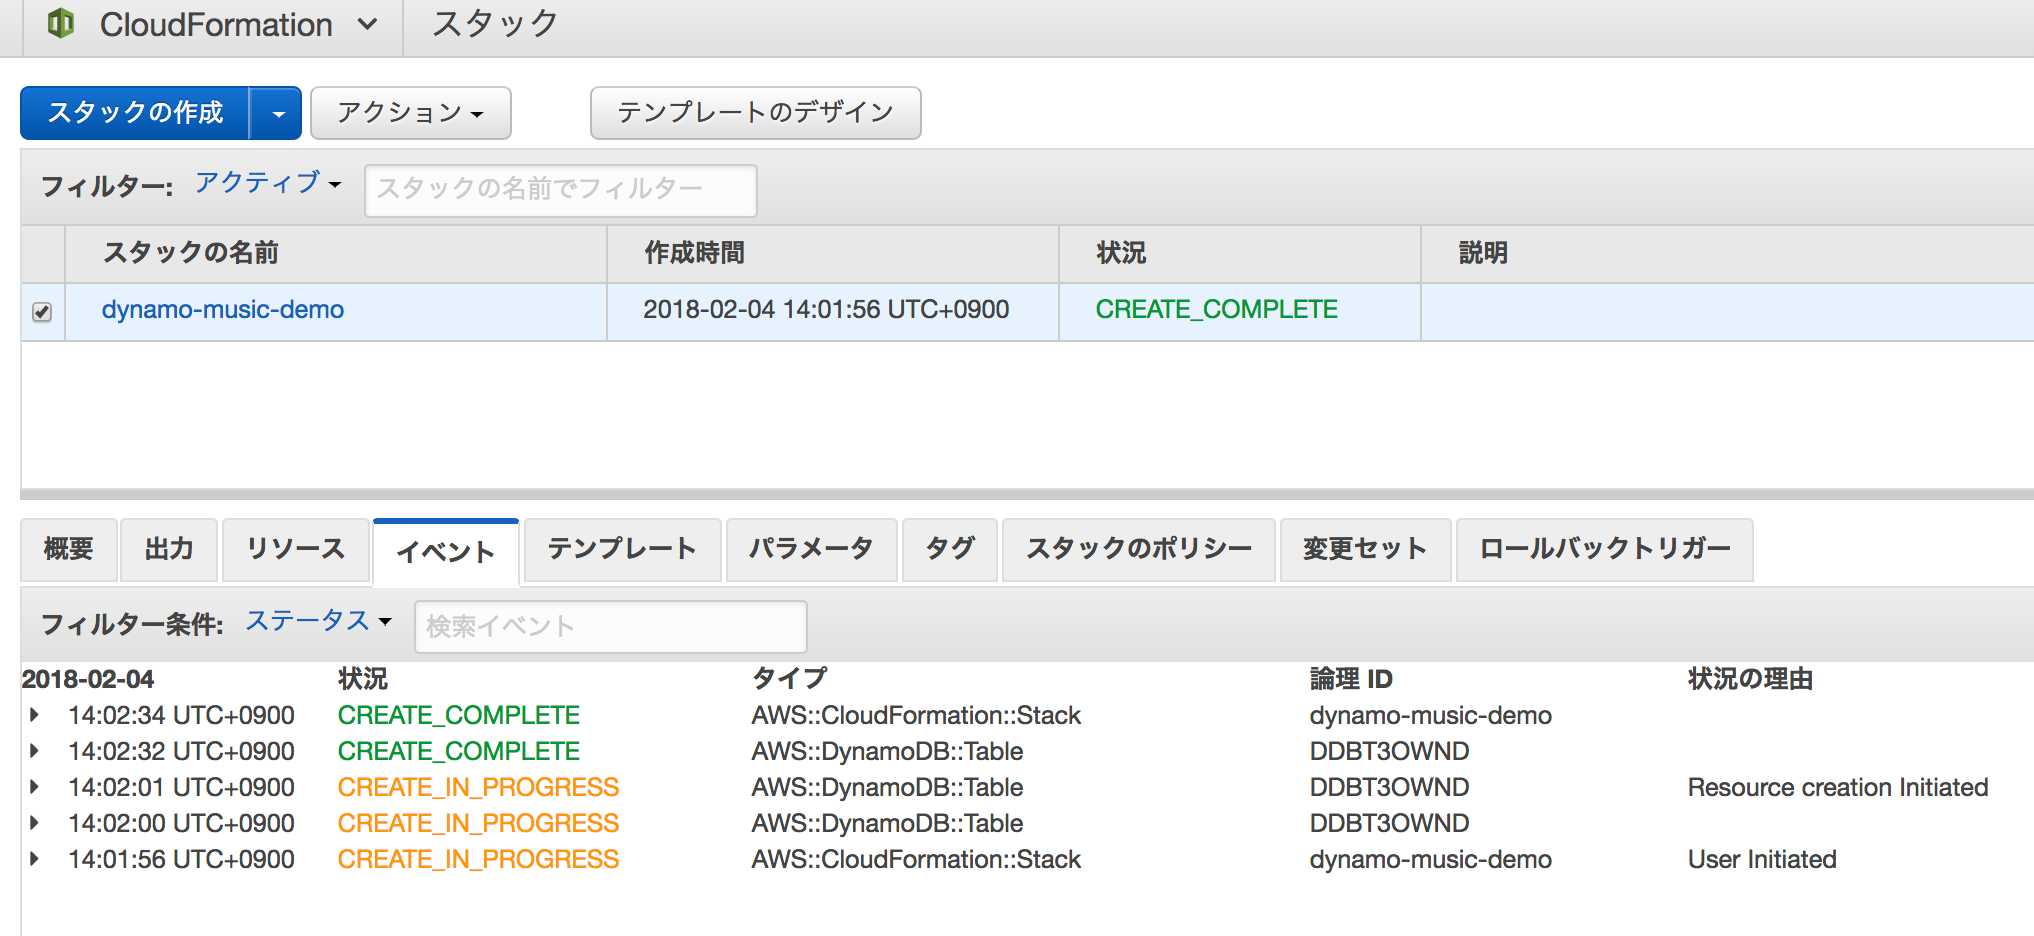 AWS CloudFormationでAmazon DynamoDBテーブルを作ってアイテム